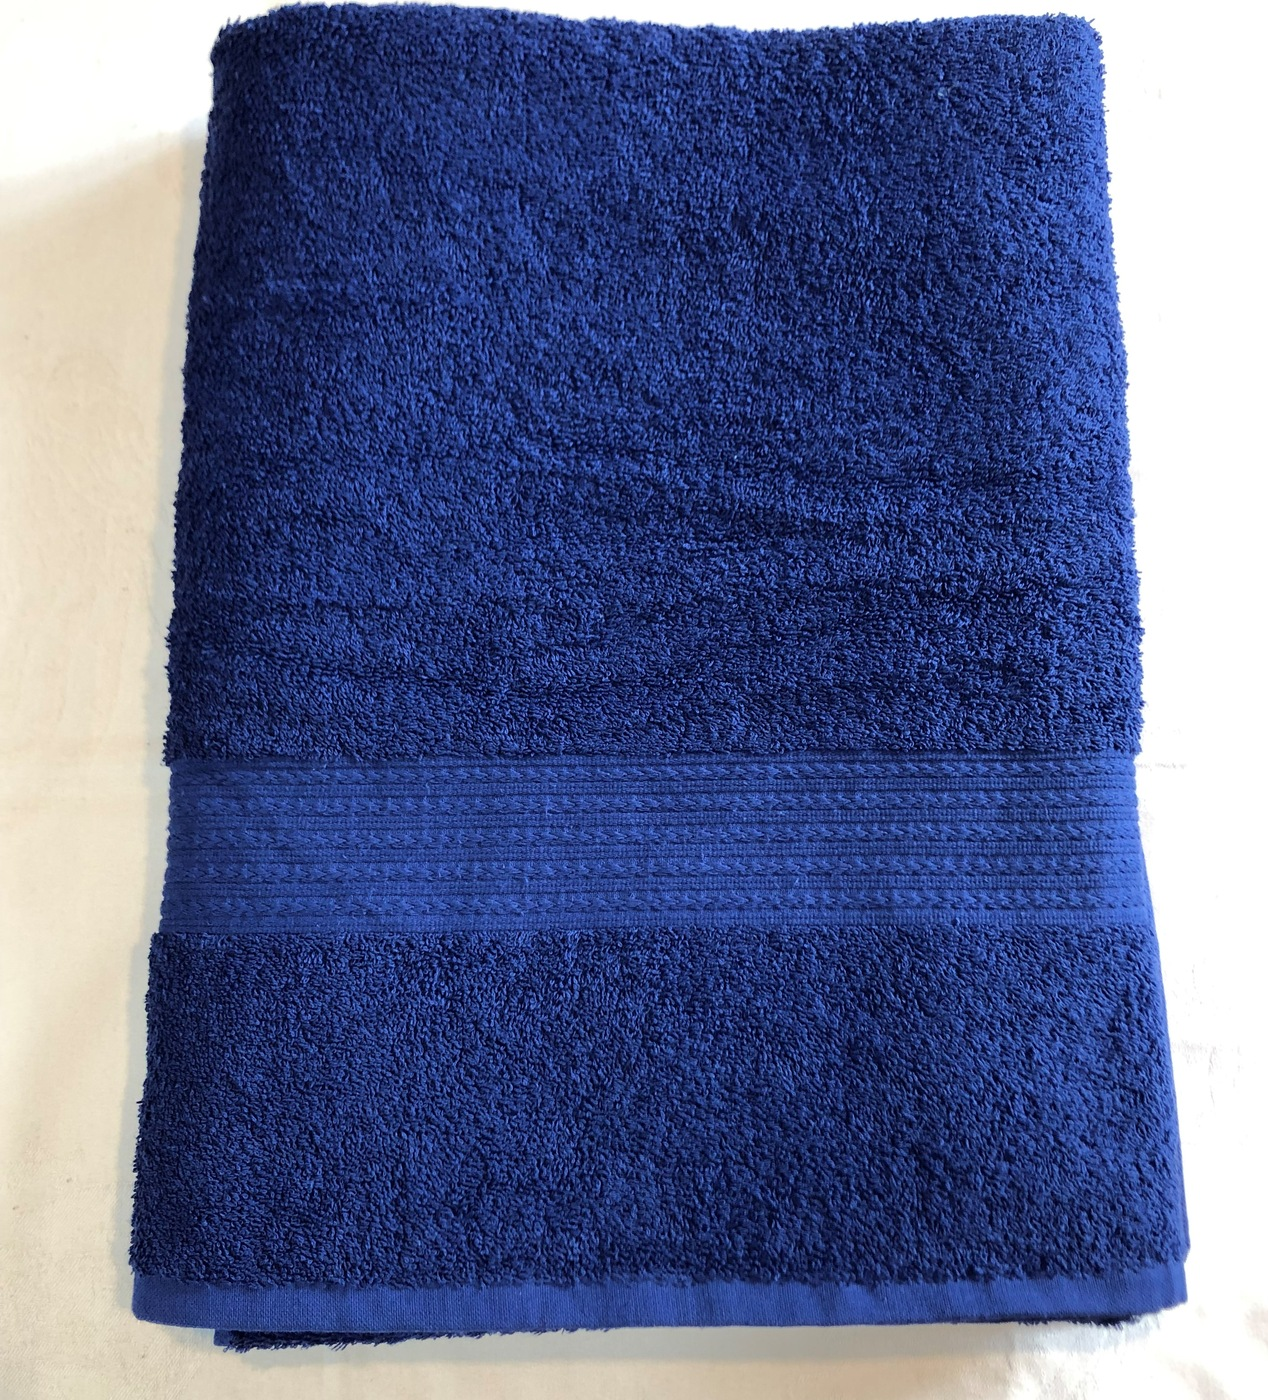 Простыня Pastel 582002 2-х спальное темно-синий блузка женская oodji collection цвет темно синий темно бежевый 21412132 2 24681 7935e размер 38 44 170